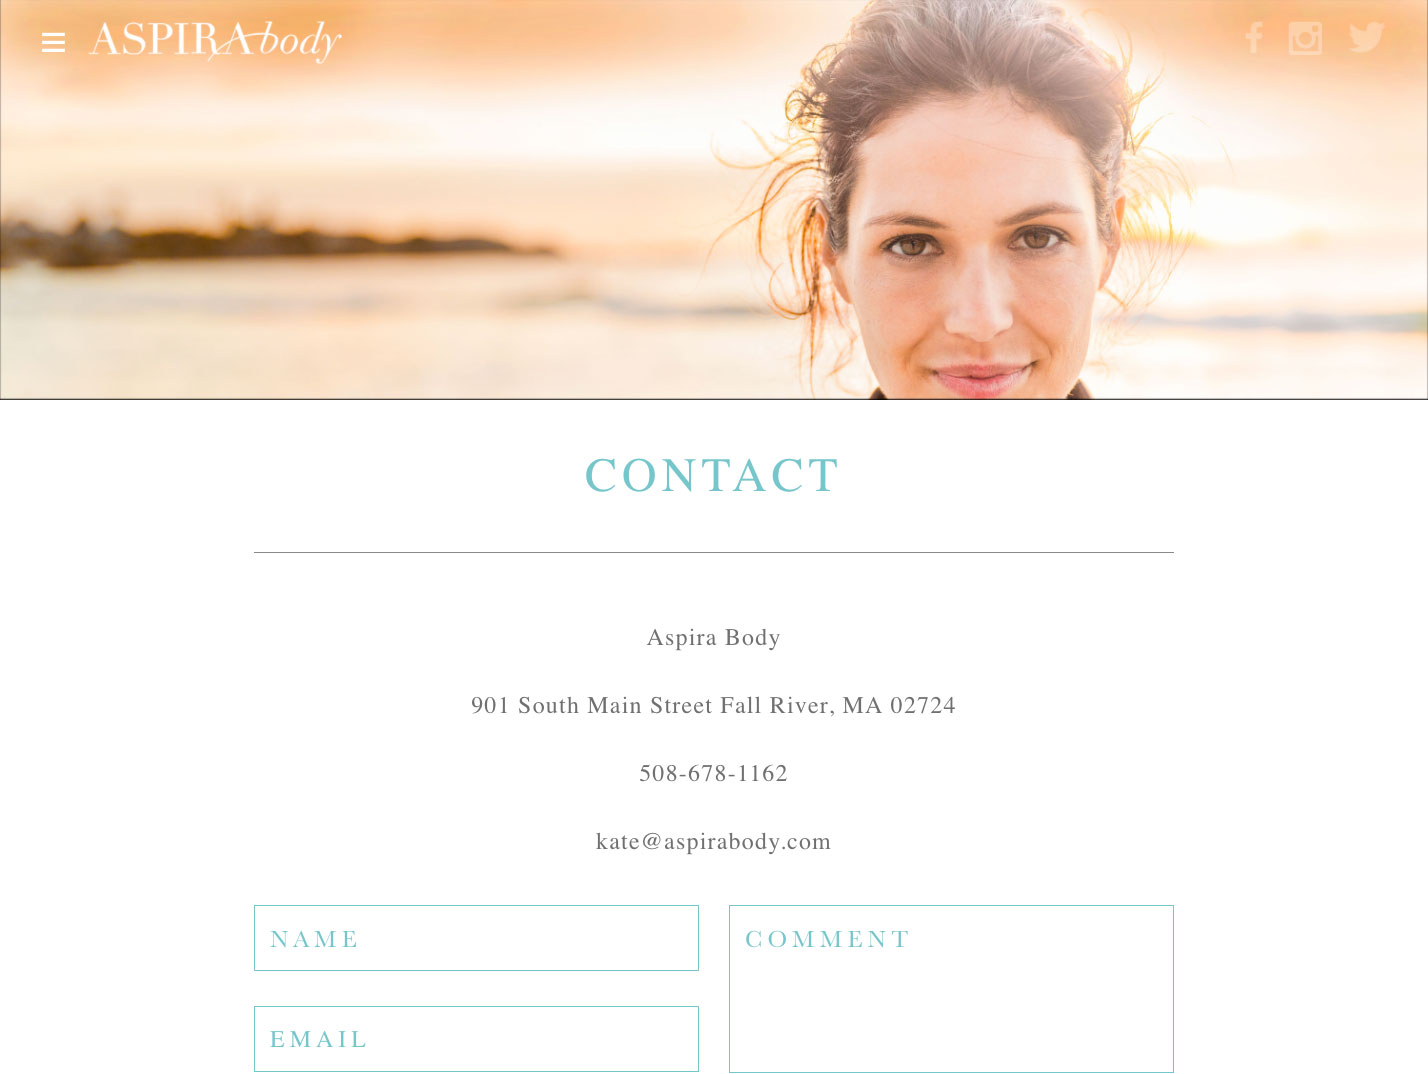 Aspira Contact Page